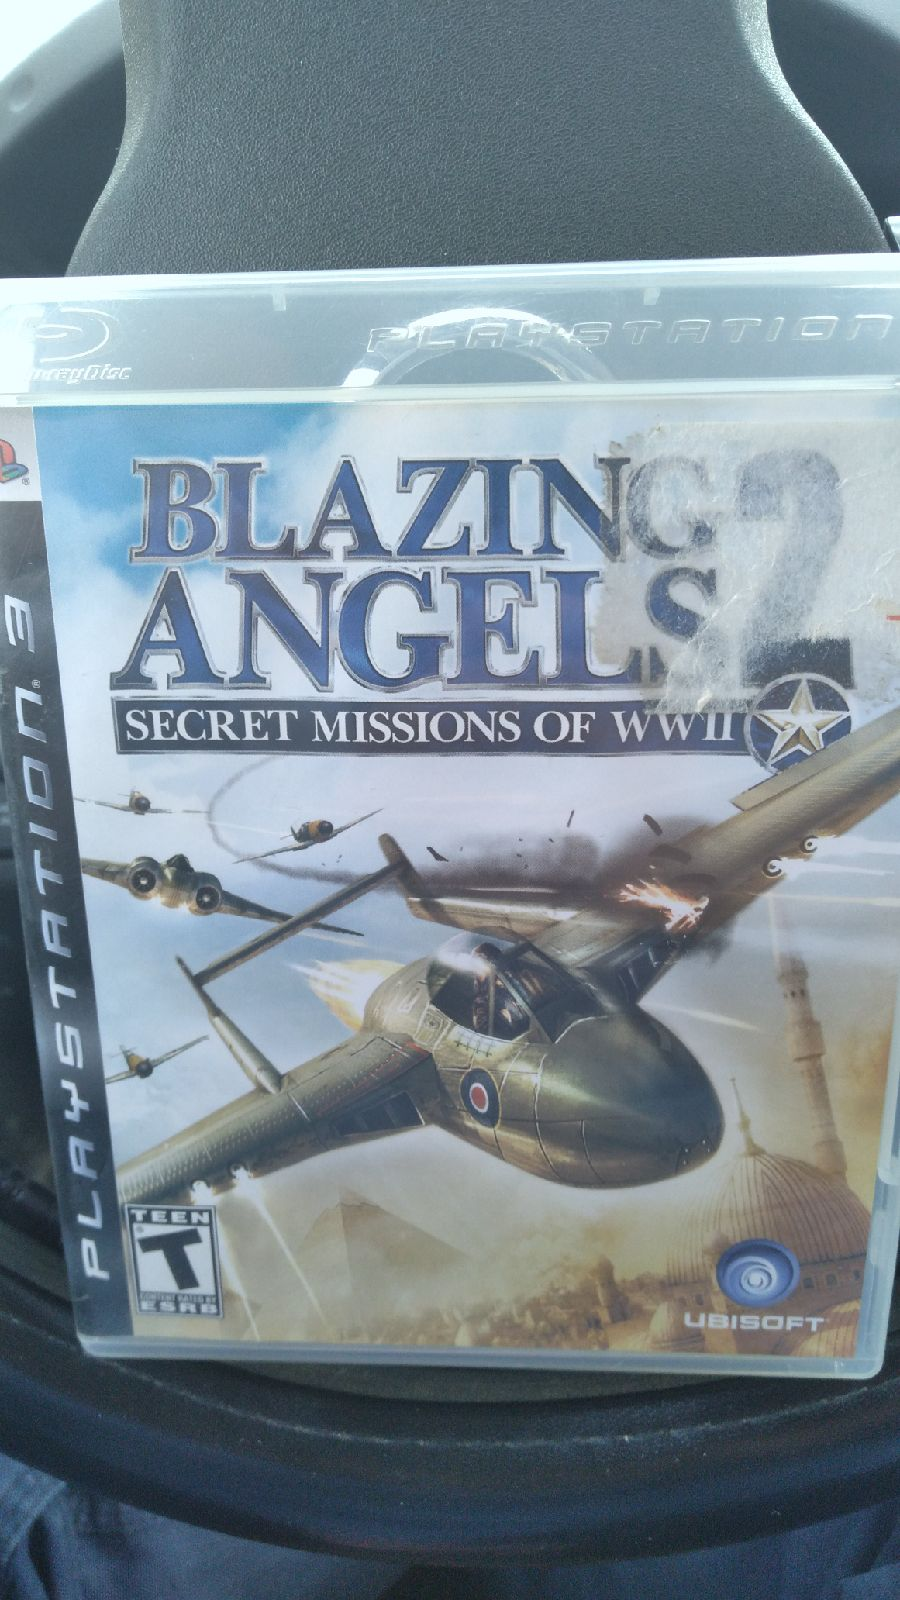 Blazing angels 2 PS3